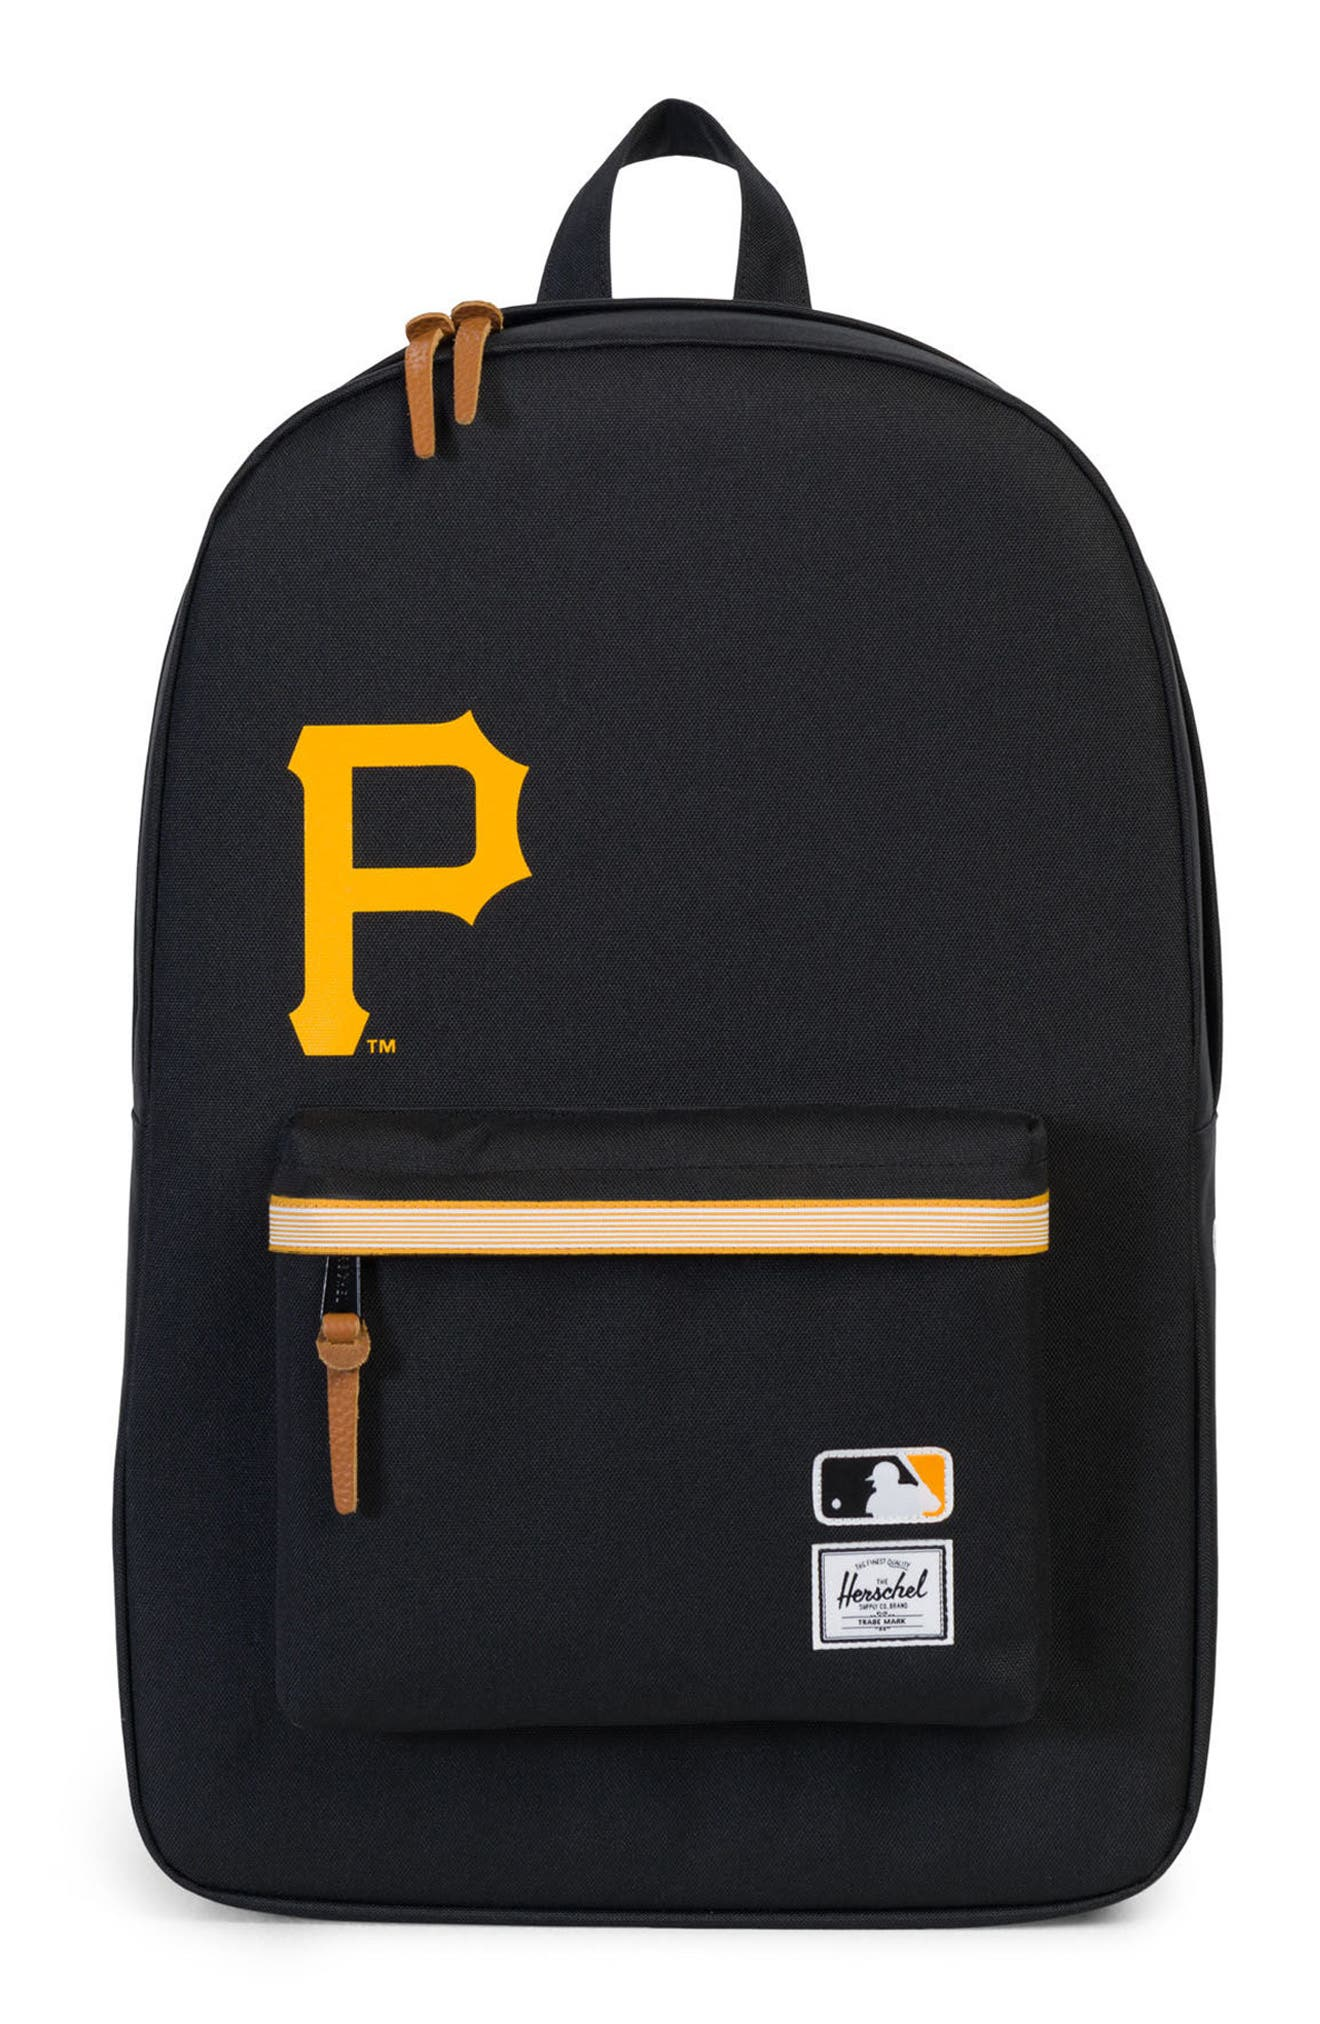 Herschel Supply Co. Heritage Pittsburgh Pirates Backpack - Black